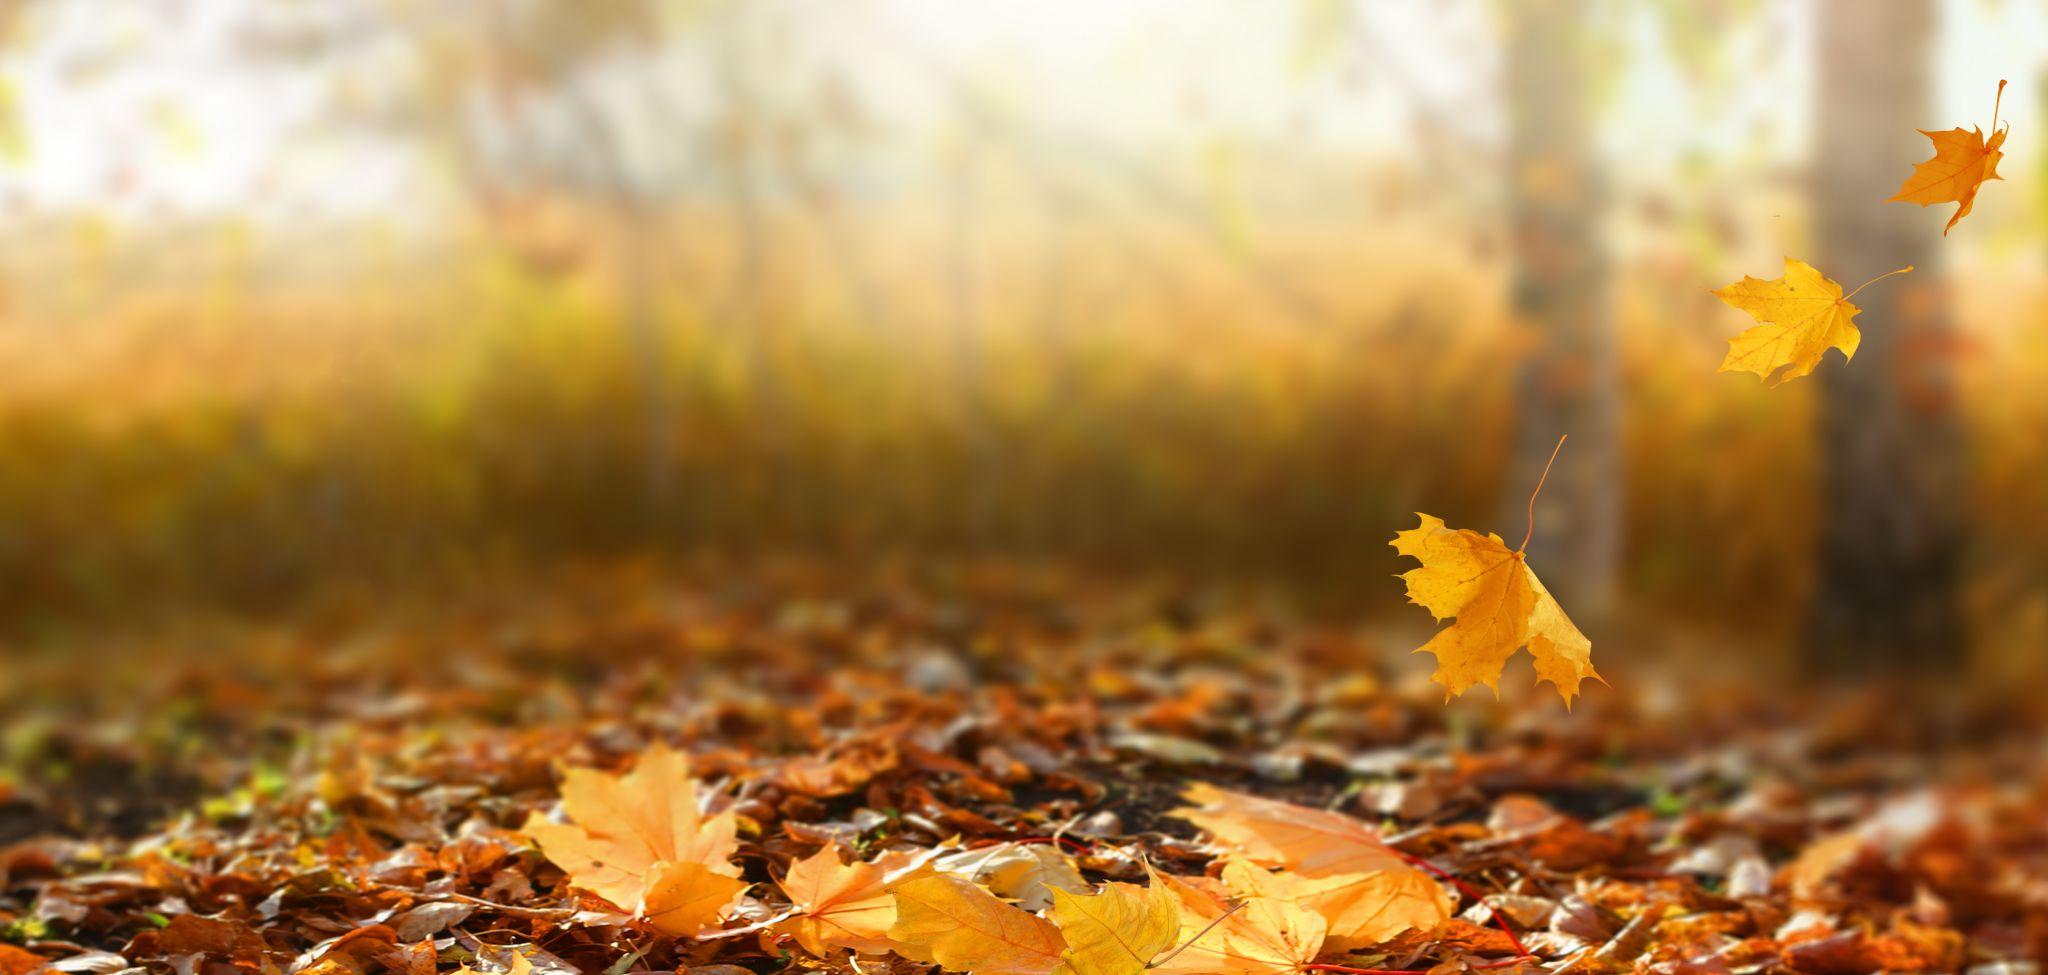 Herbstblätter © shutterstock